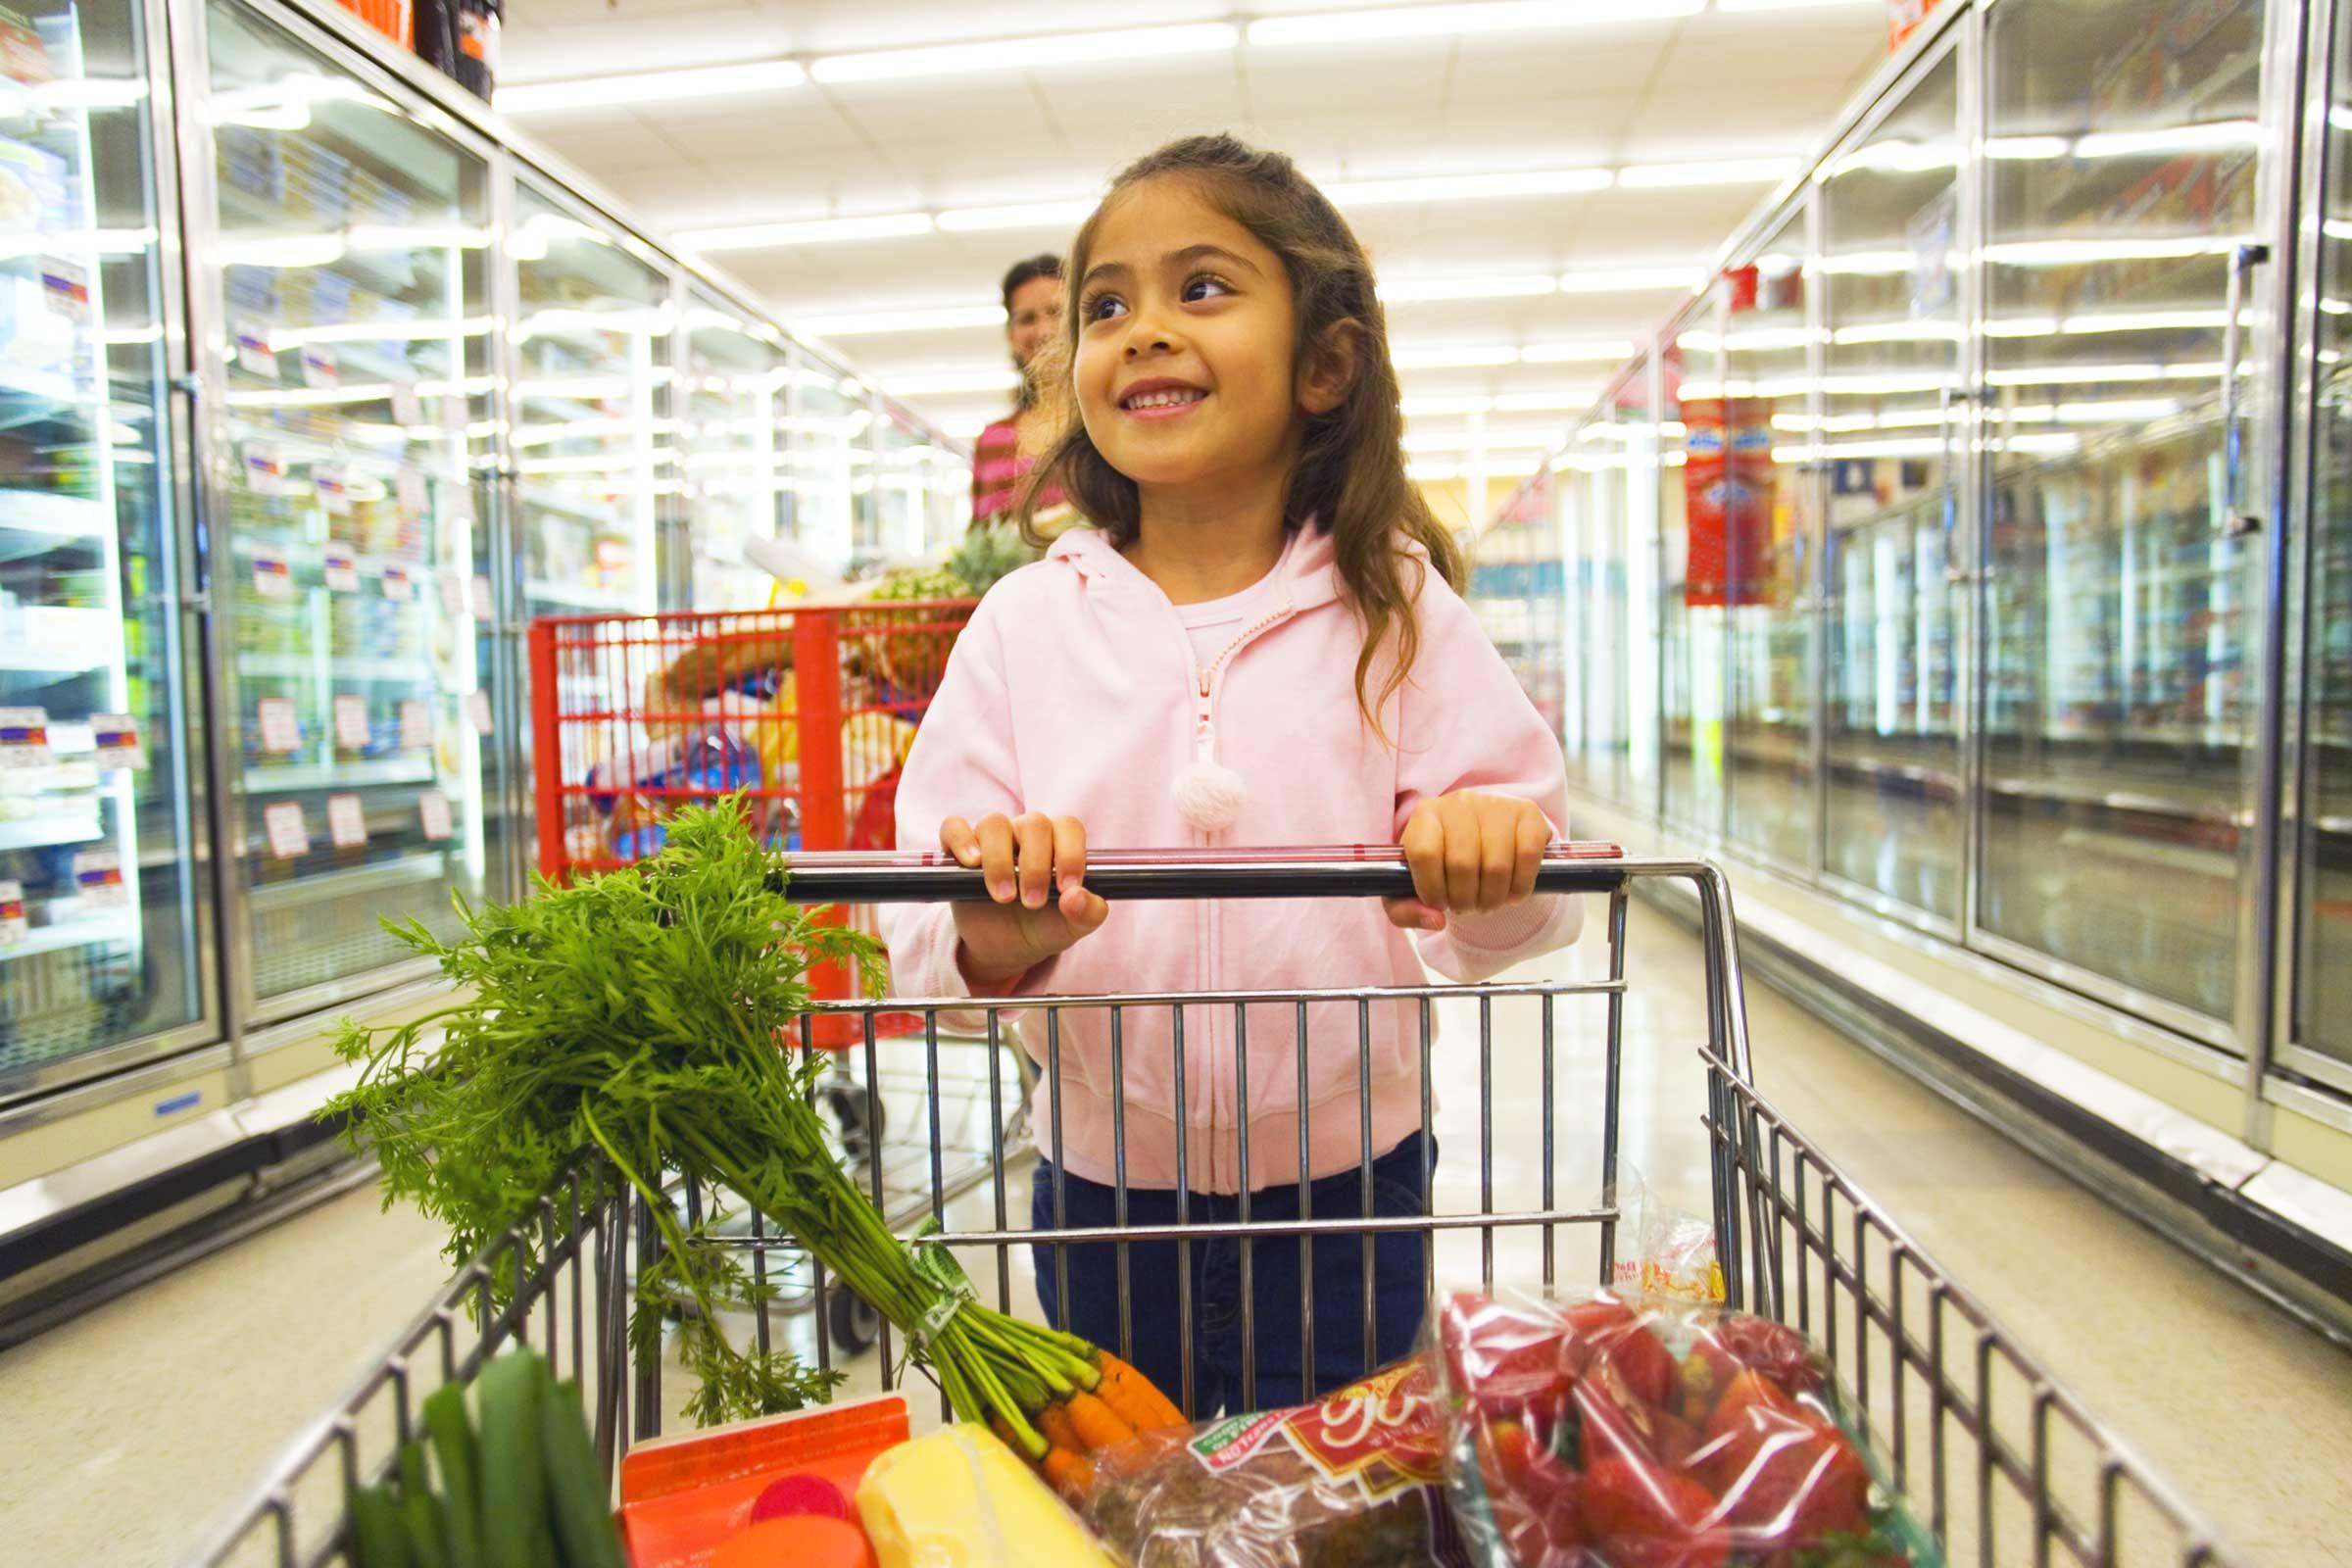 Buying young girls #15